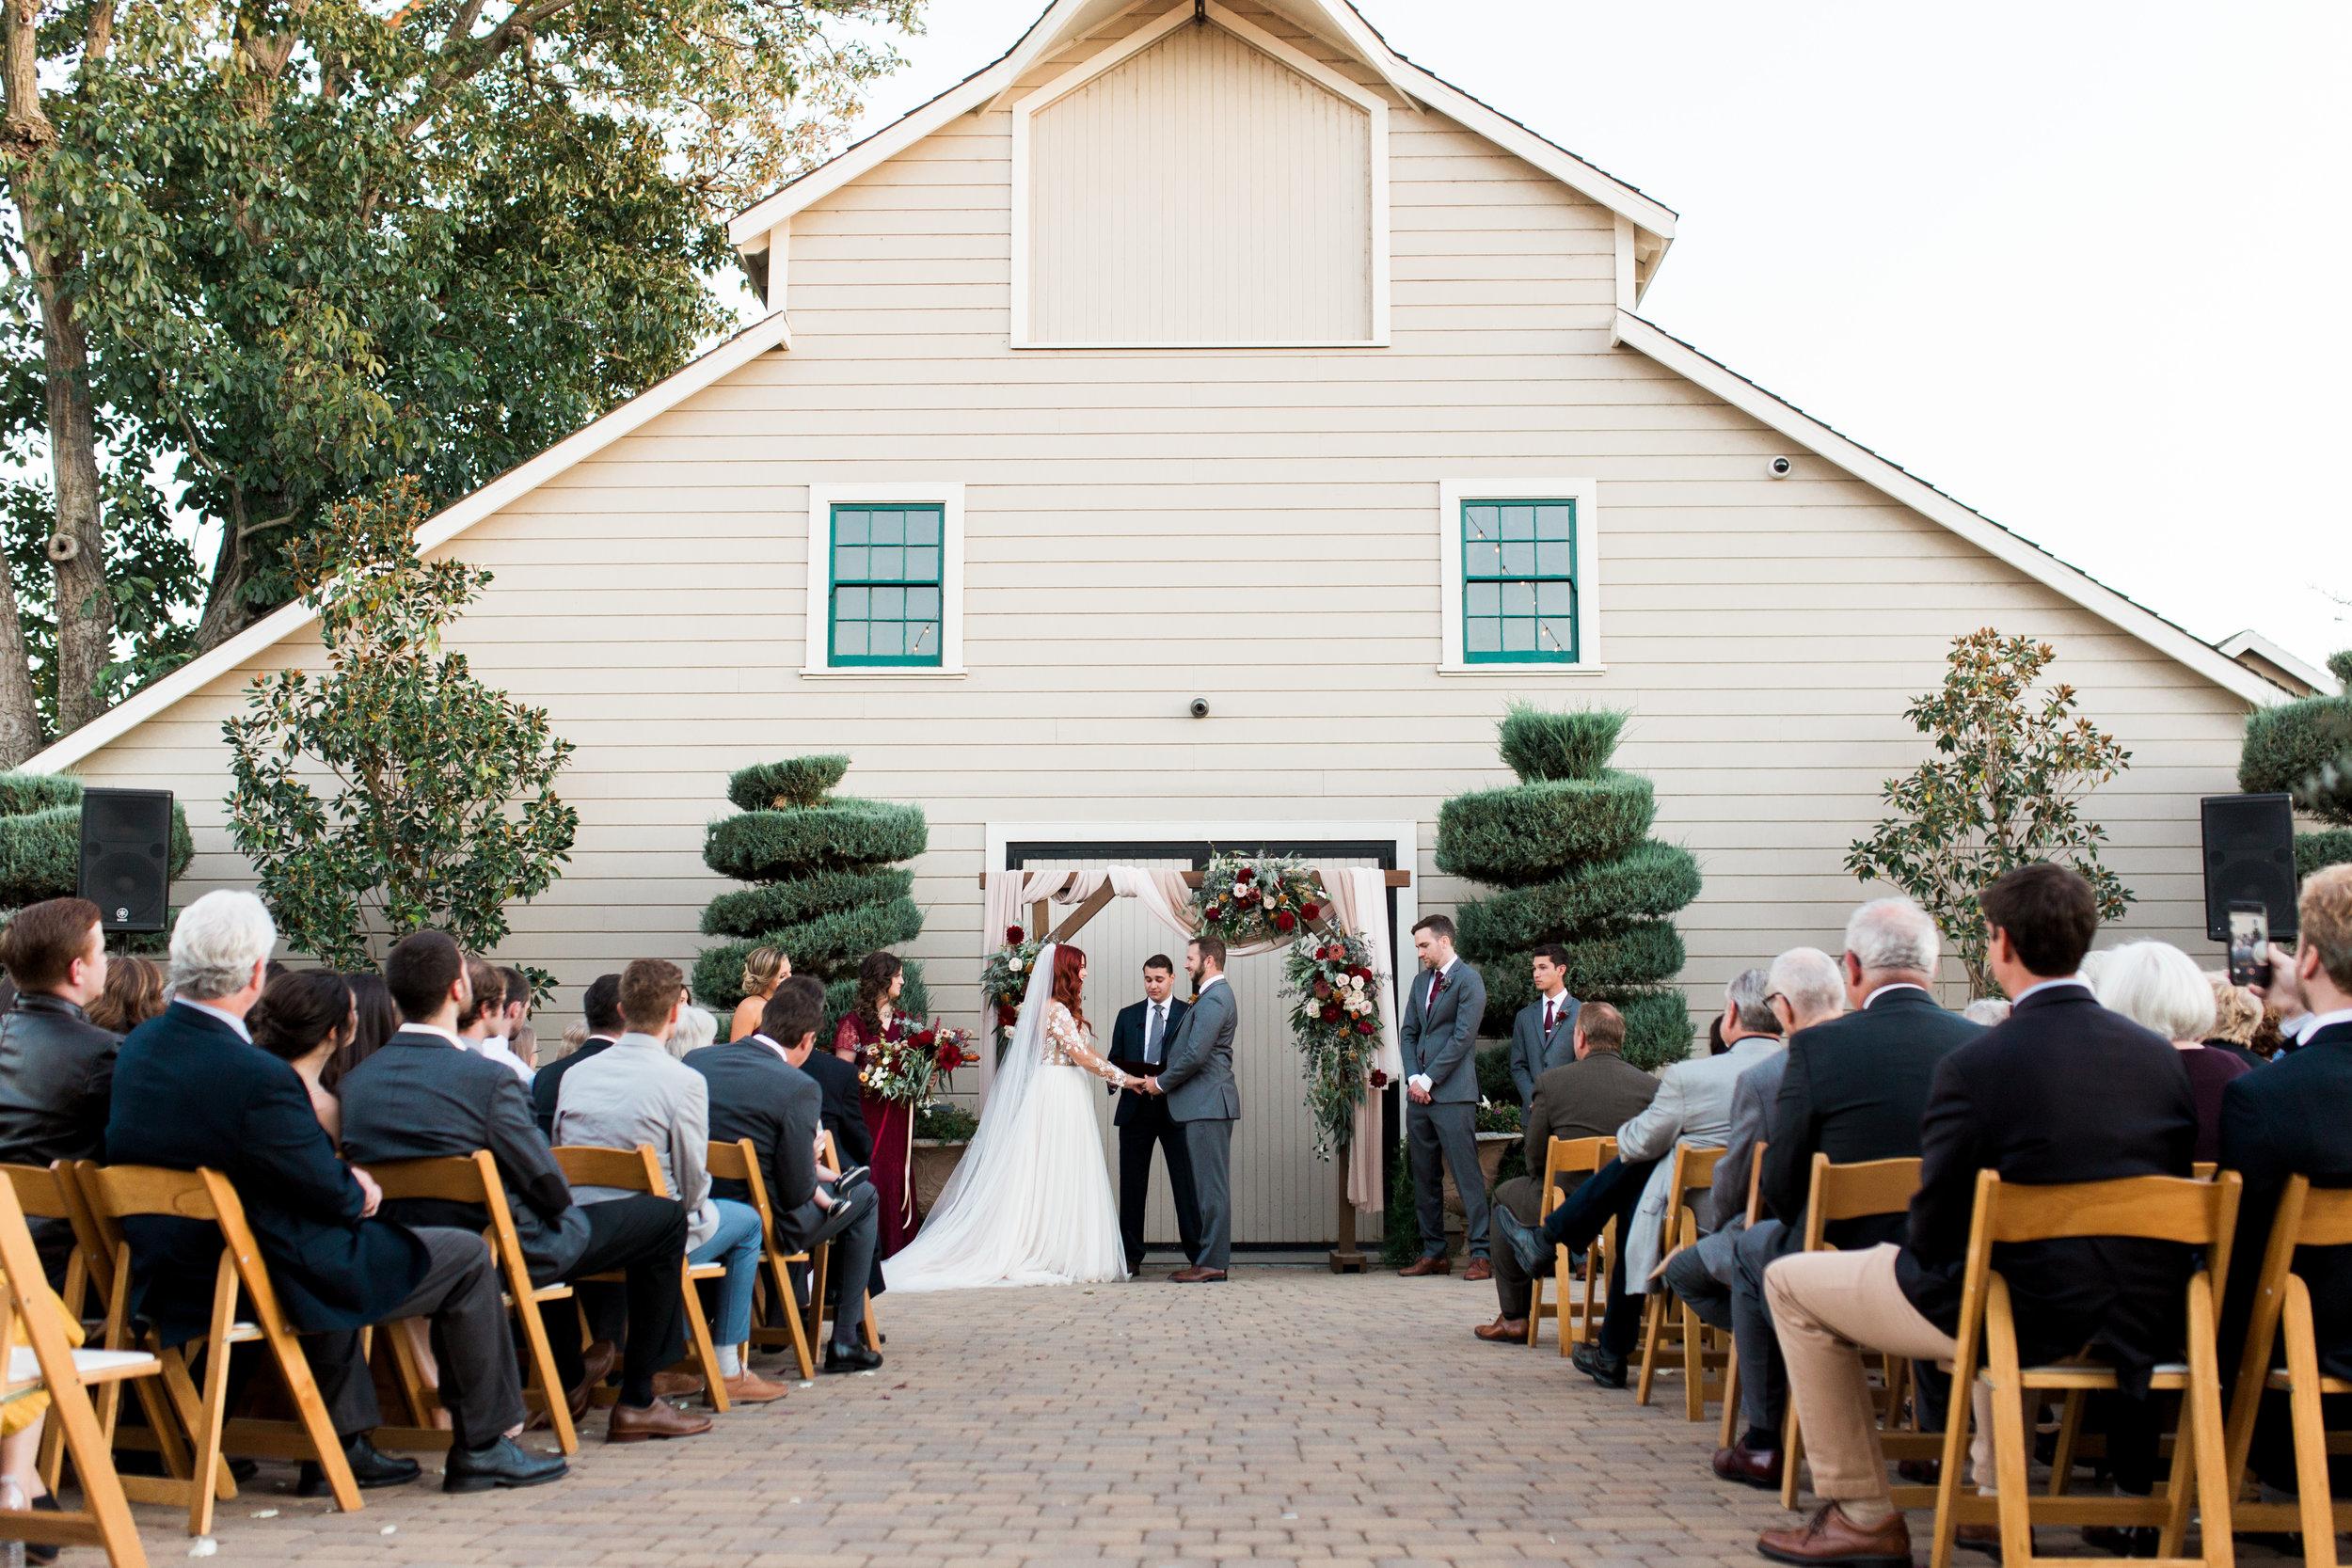 fall-inspired-wedding-at-scribner-bend-vineyards-in-sacramento-california-11.jpg